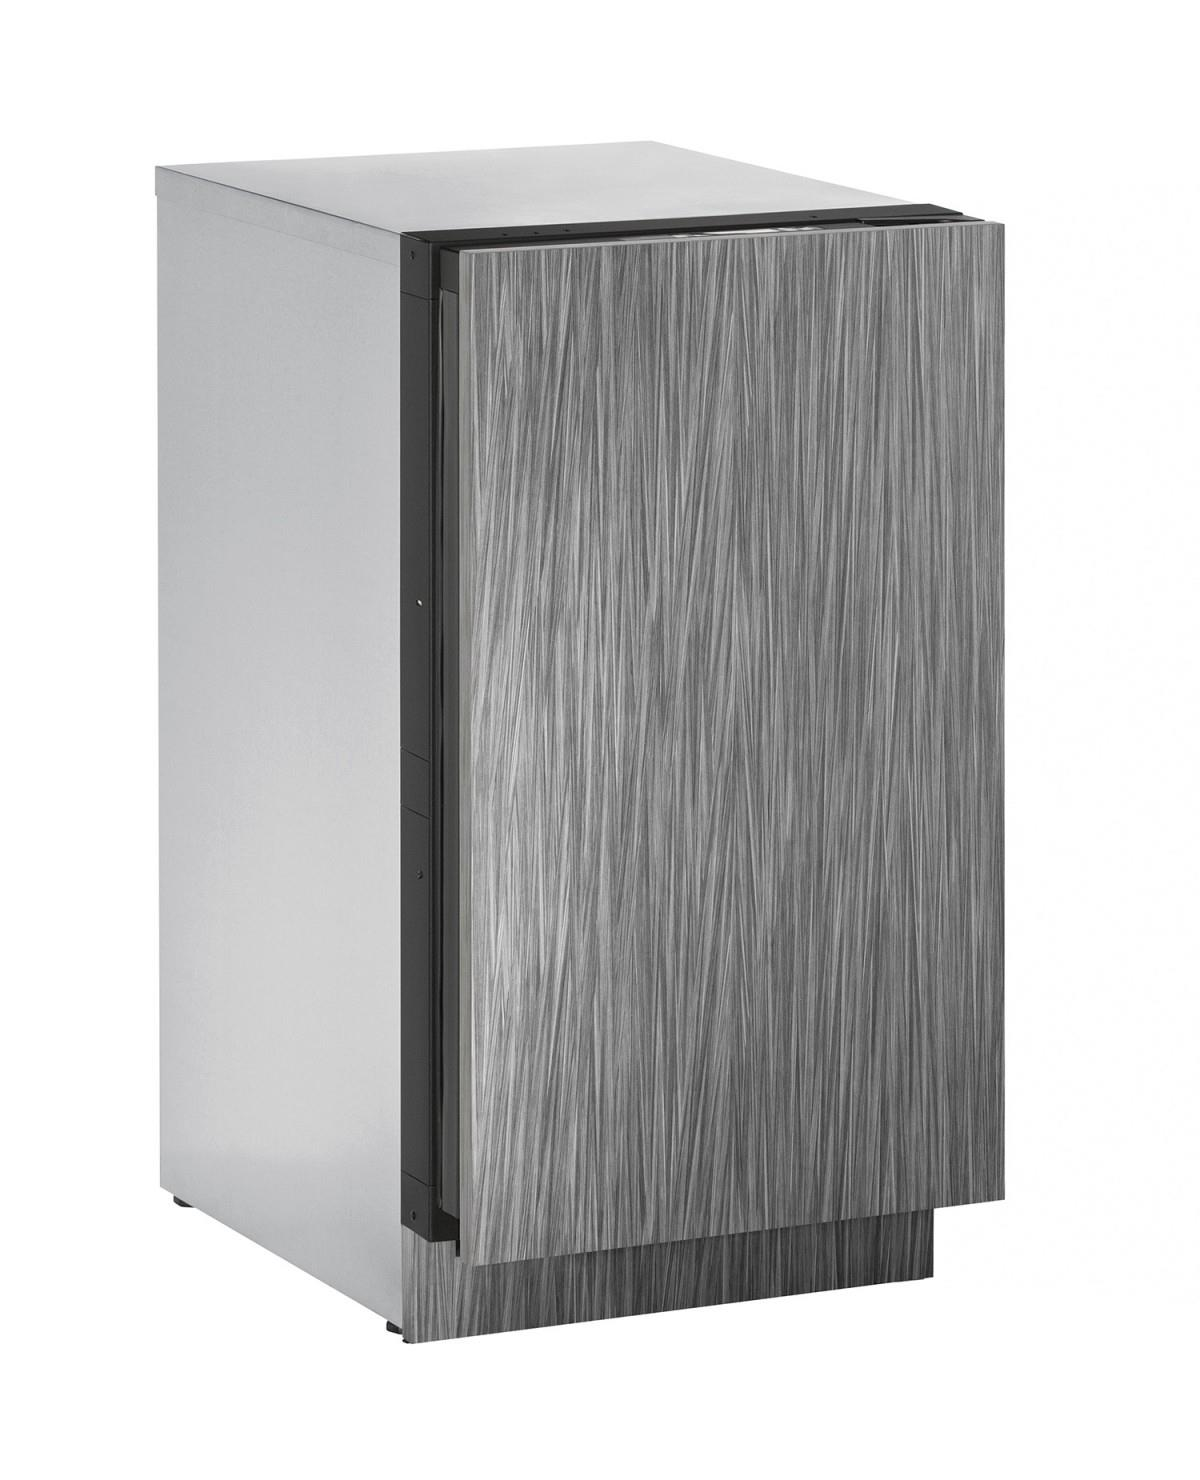 "U-Line Refrigerators 18"" Solid Door Refrigerator - Item Number: U-3018RINT-00A"